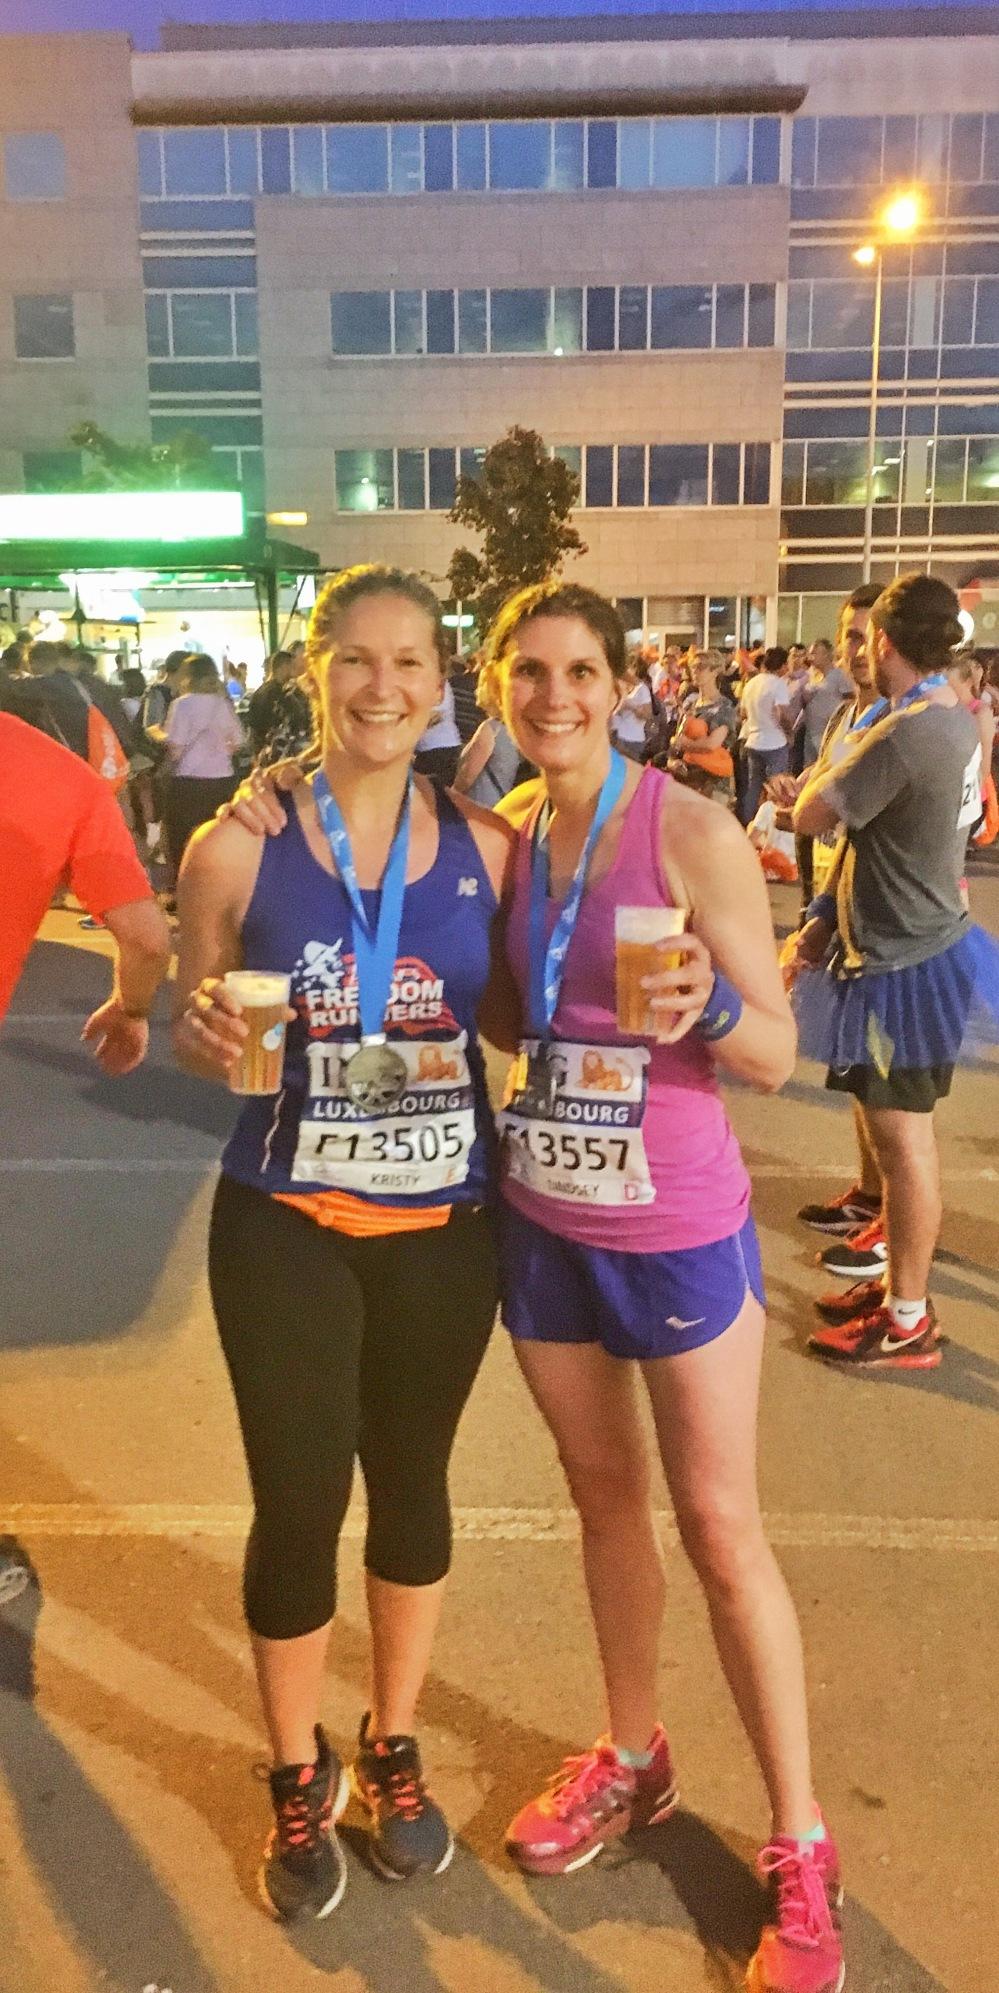 Finishing half marathons deserves a beer or two